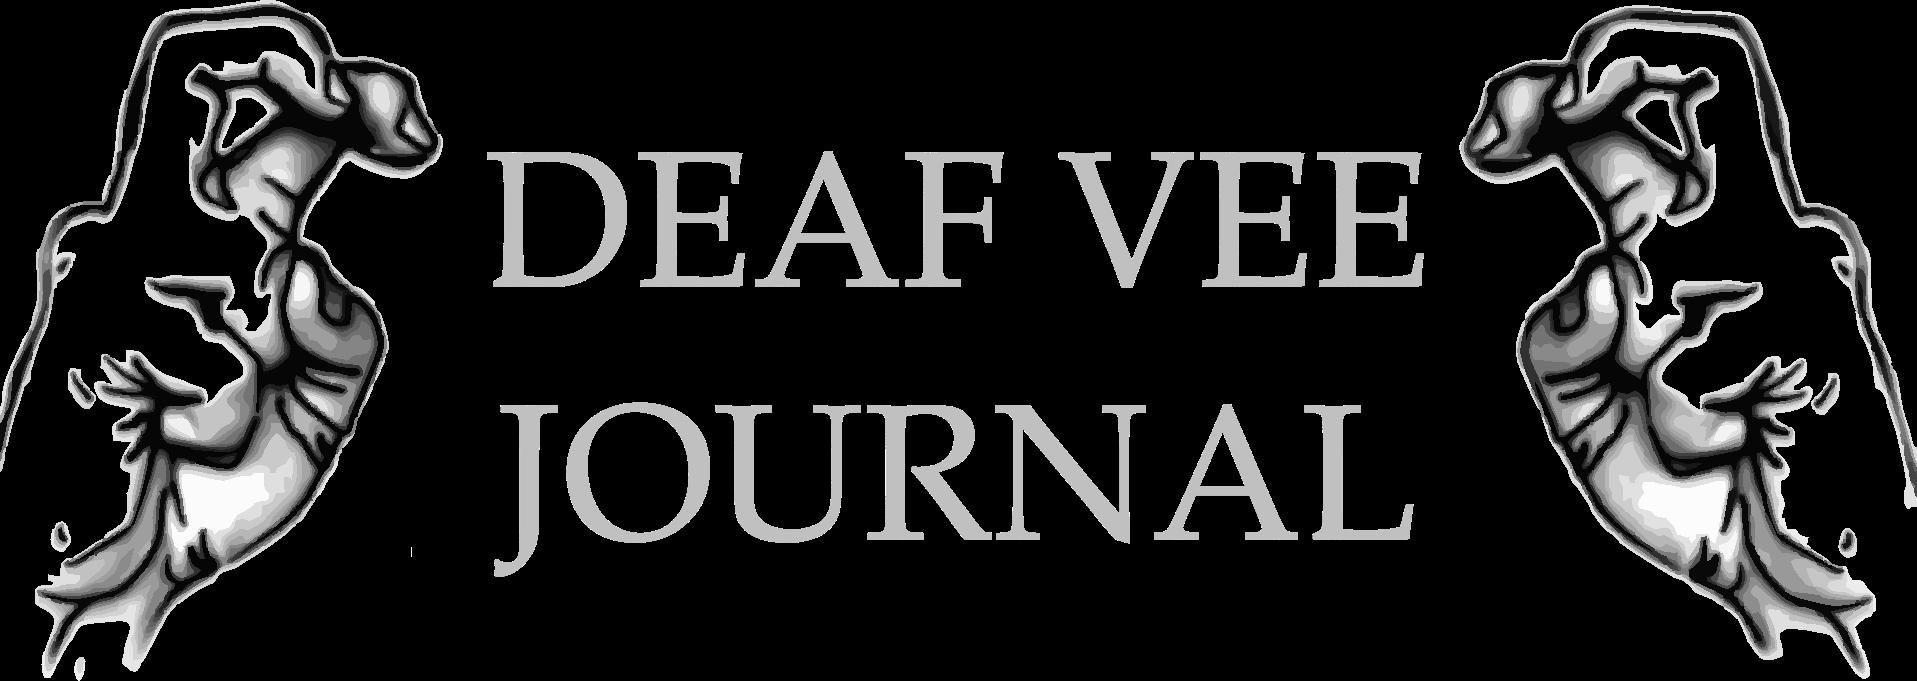 Deaf Vee Journal Announcement